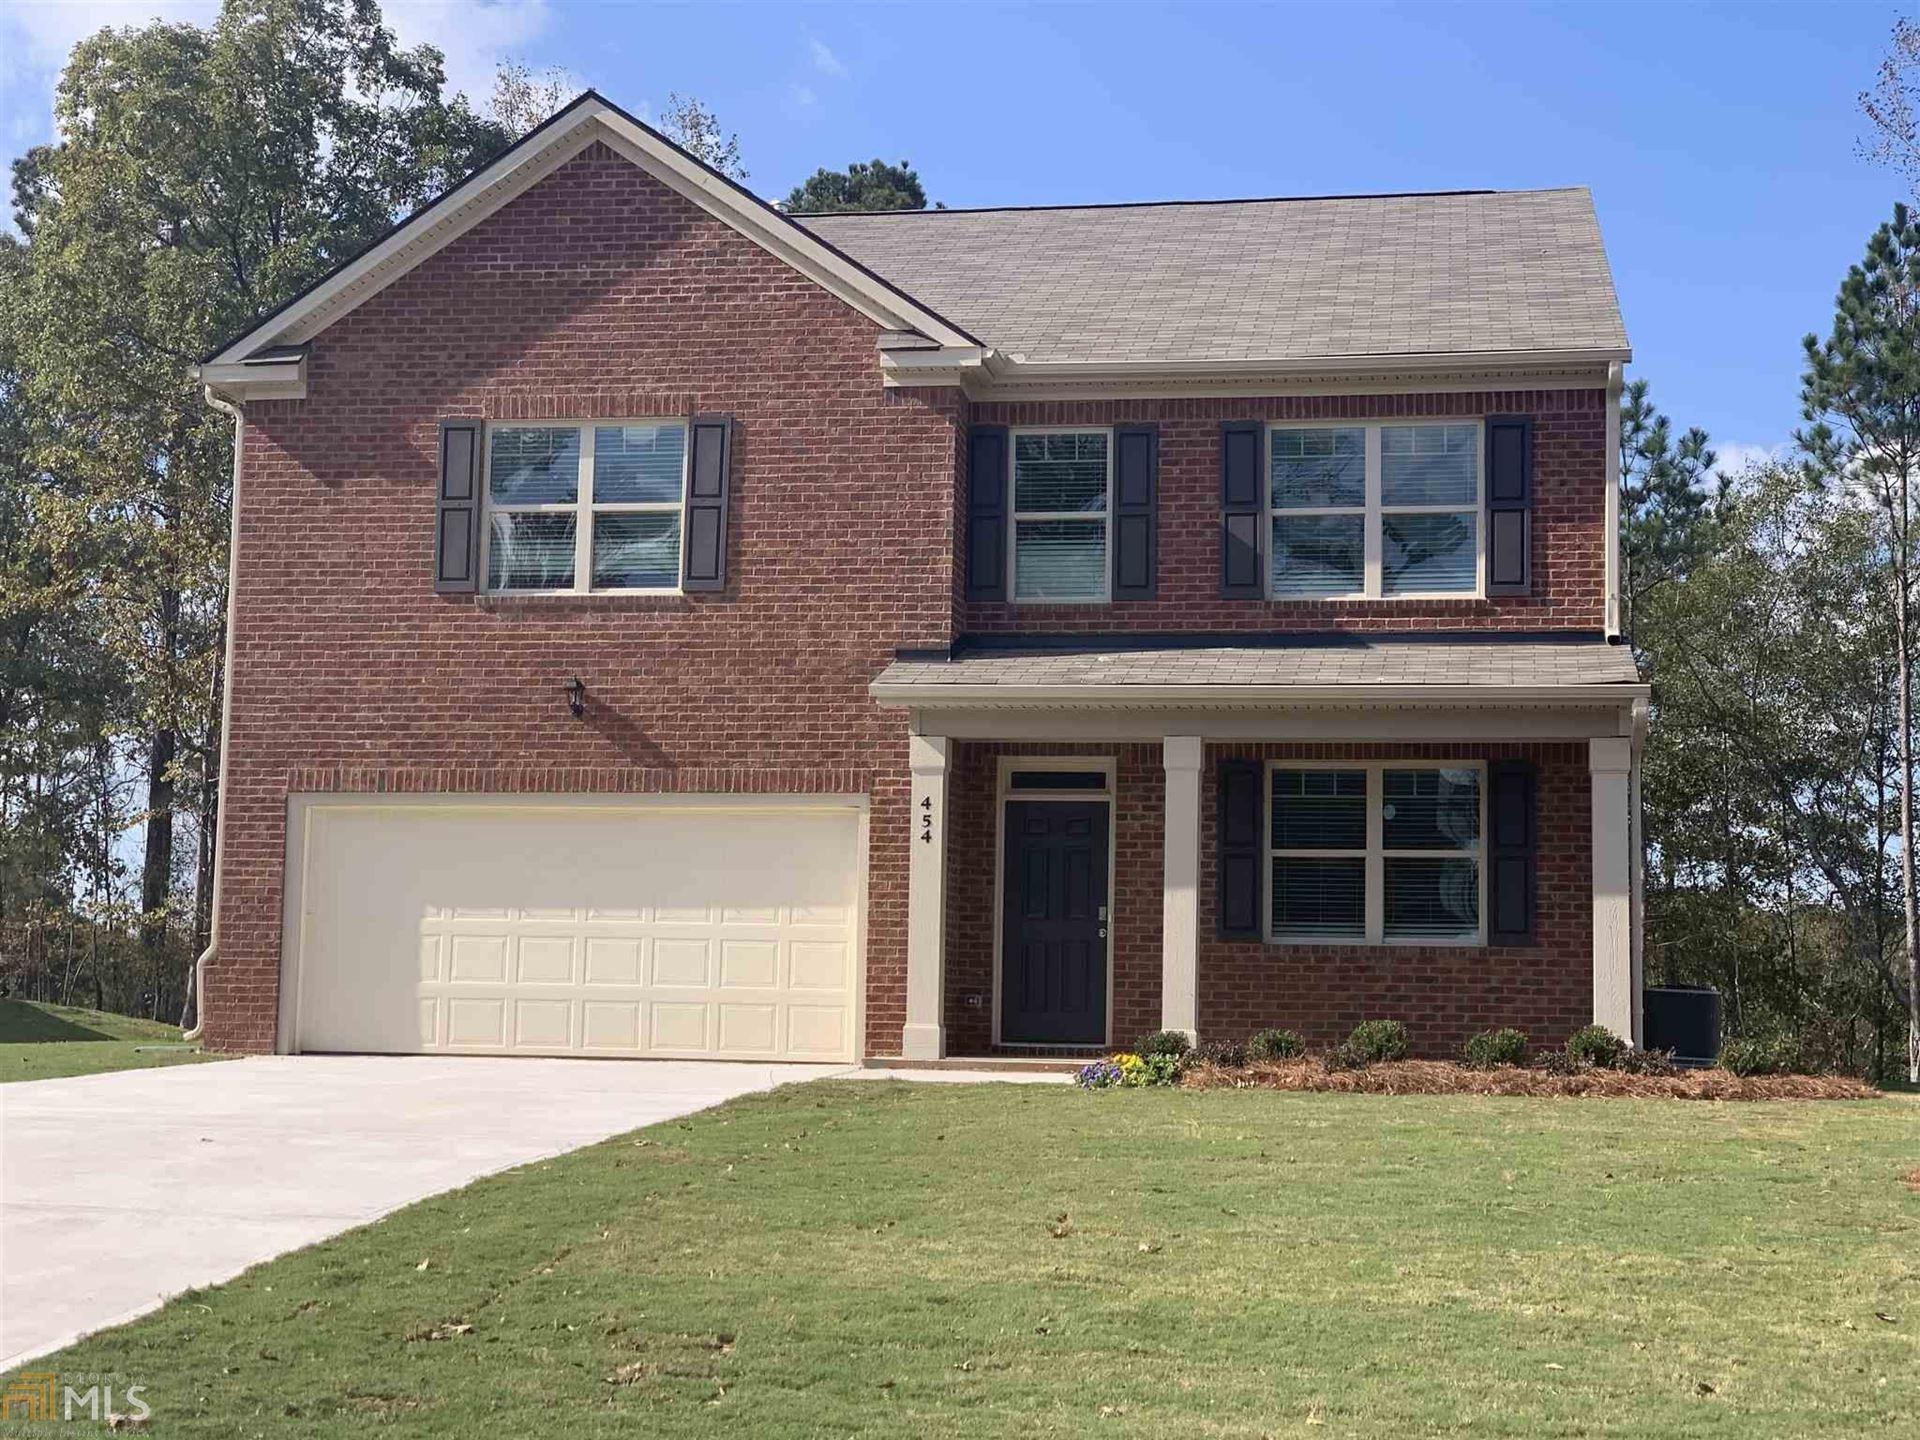 742 Tallowtree Ln, McDonough, GA 30252 - MLS#: 8880120